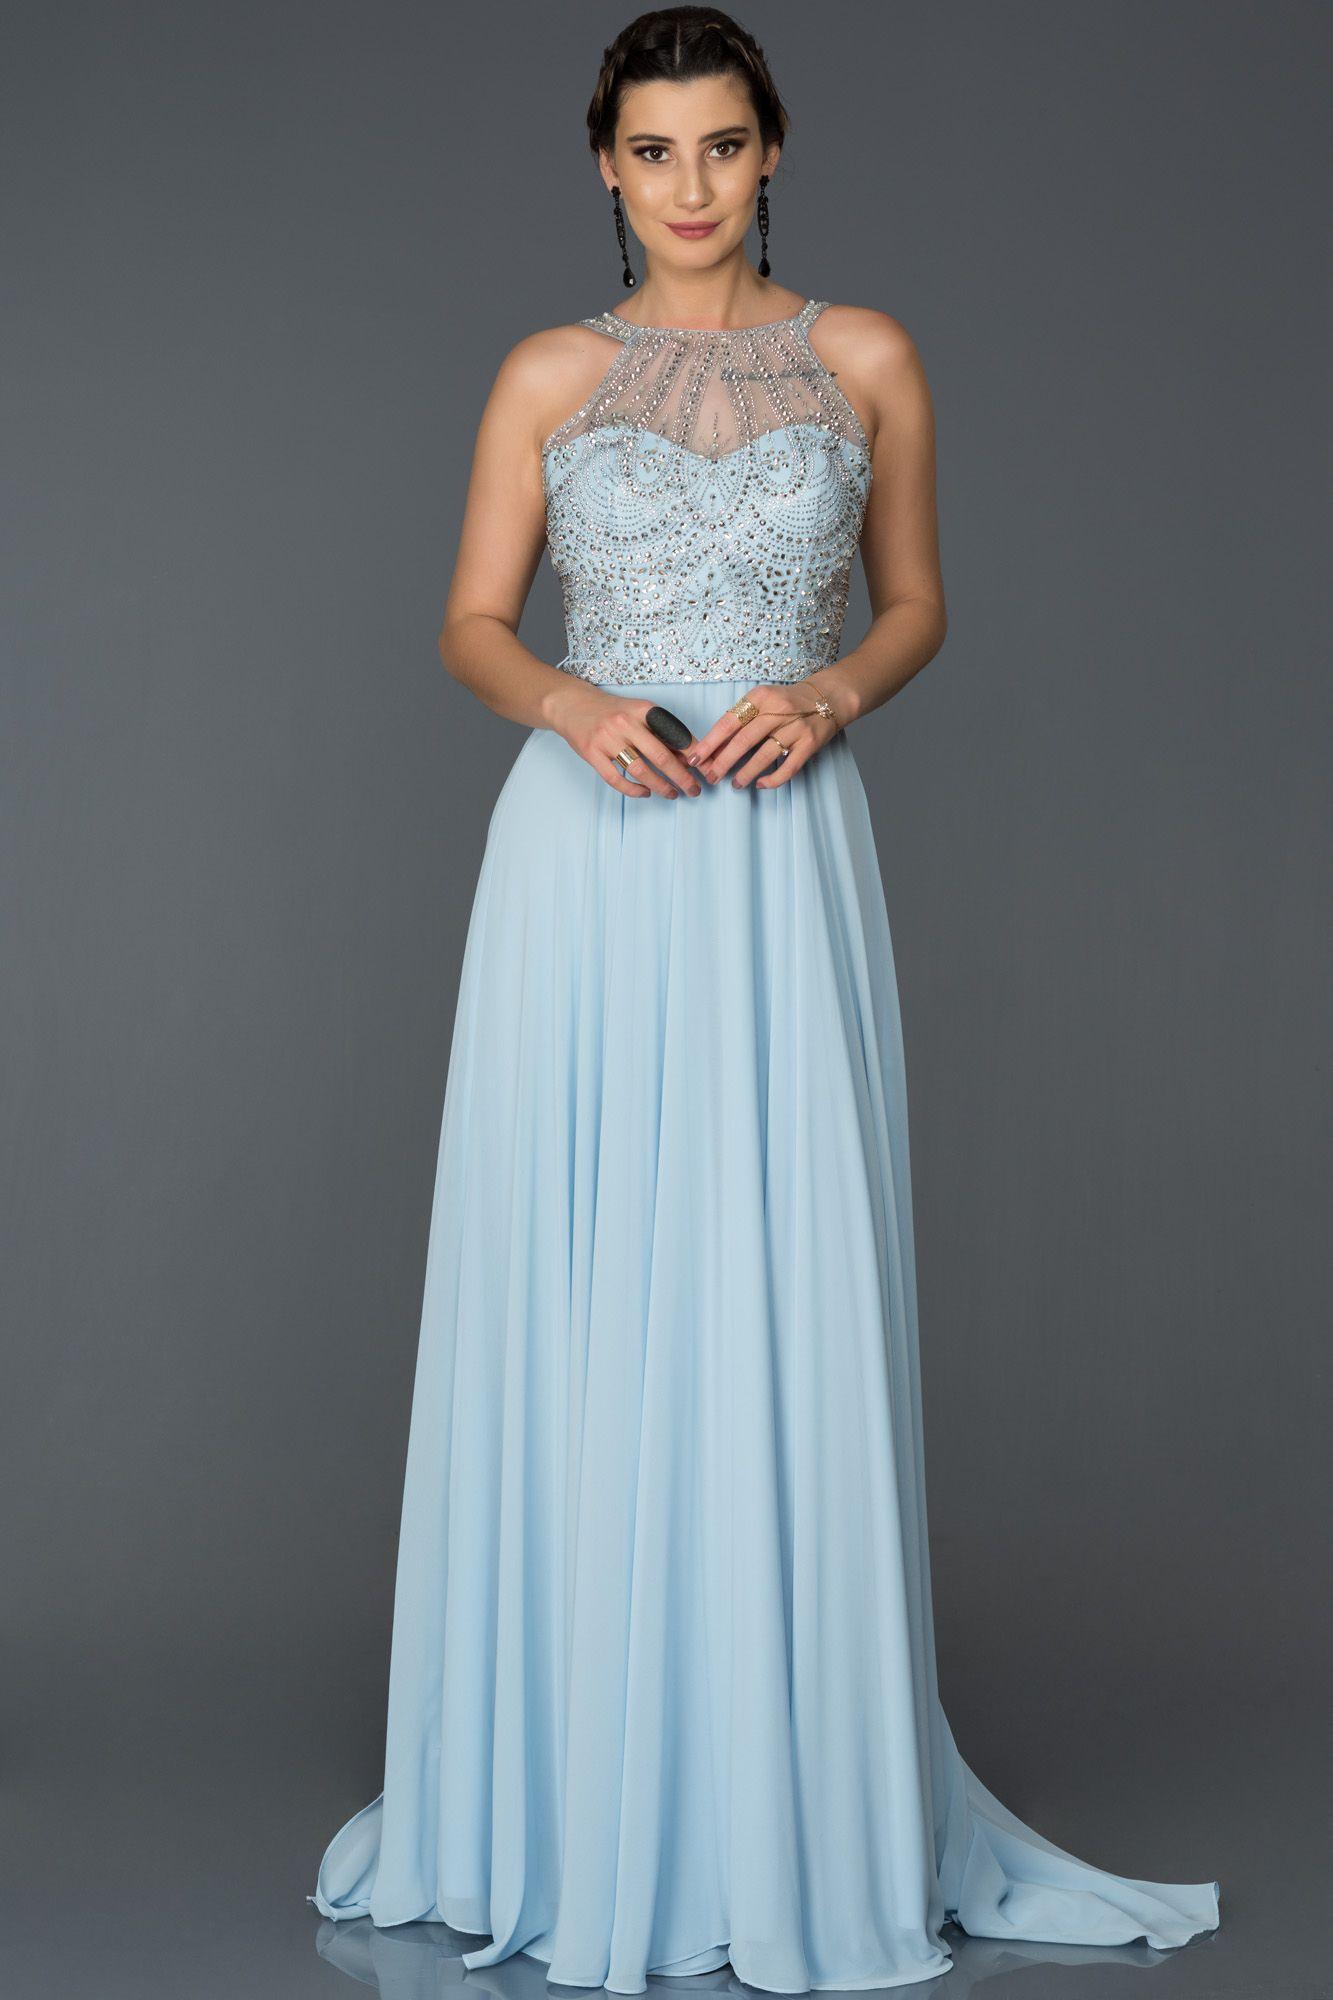 Ozel Tasarim Abiye Elbise Ab7490 The Dress Elbise Elbiseler